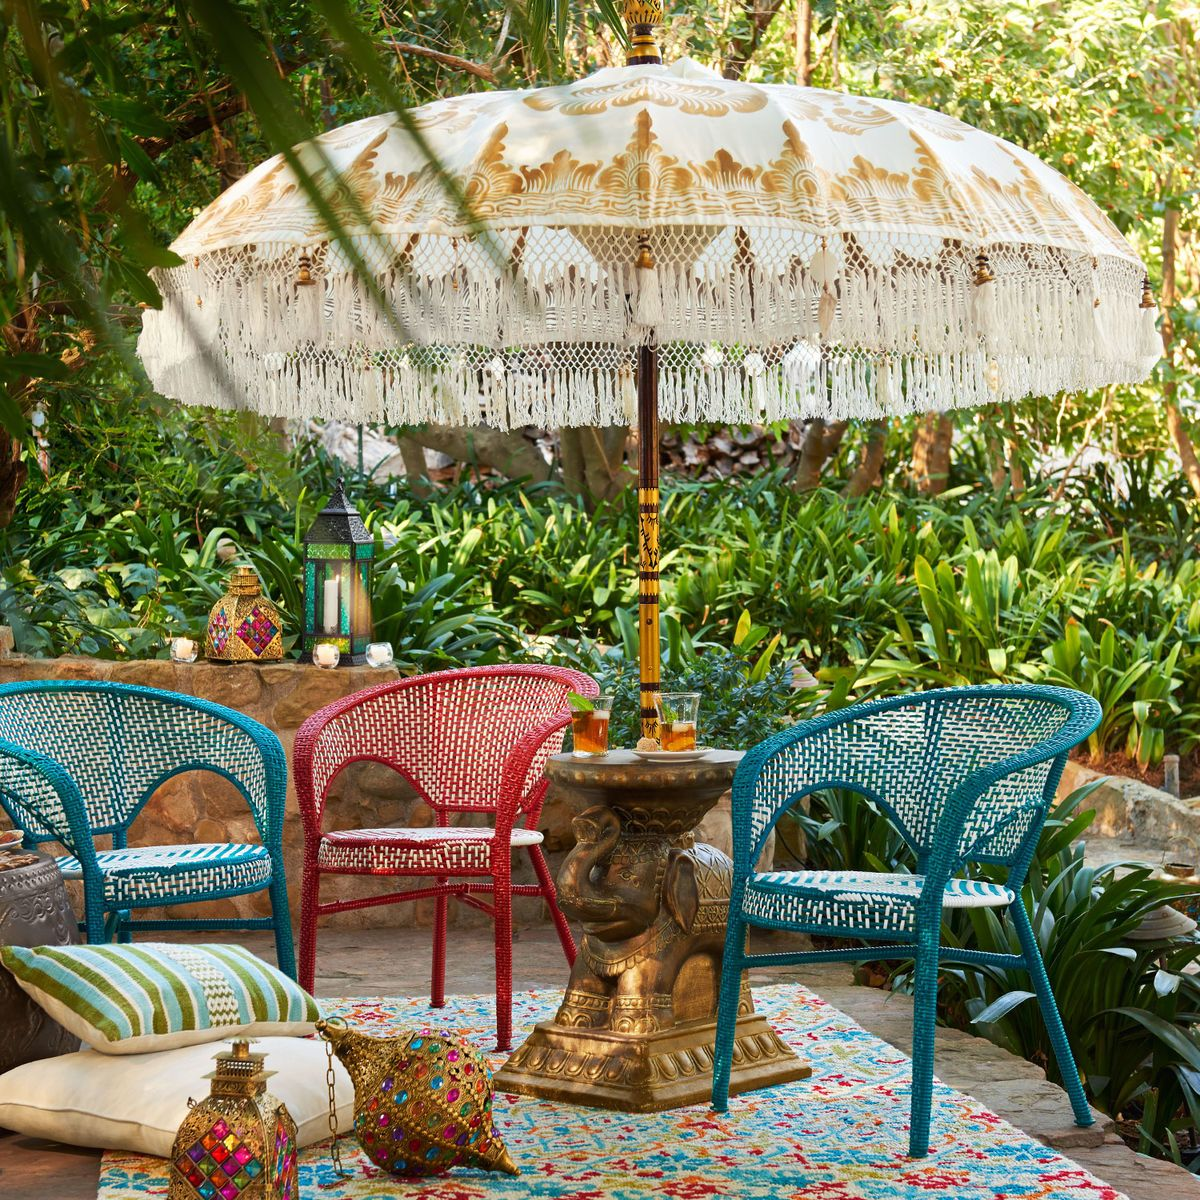 High Quality Balinese Umbrella | Pier 1 Imports